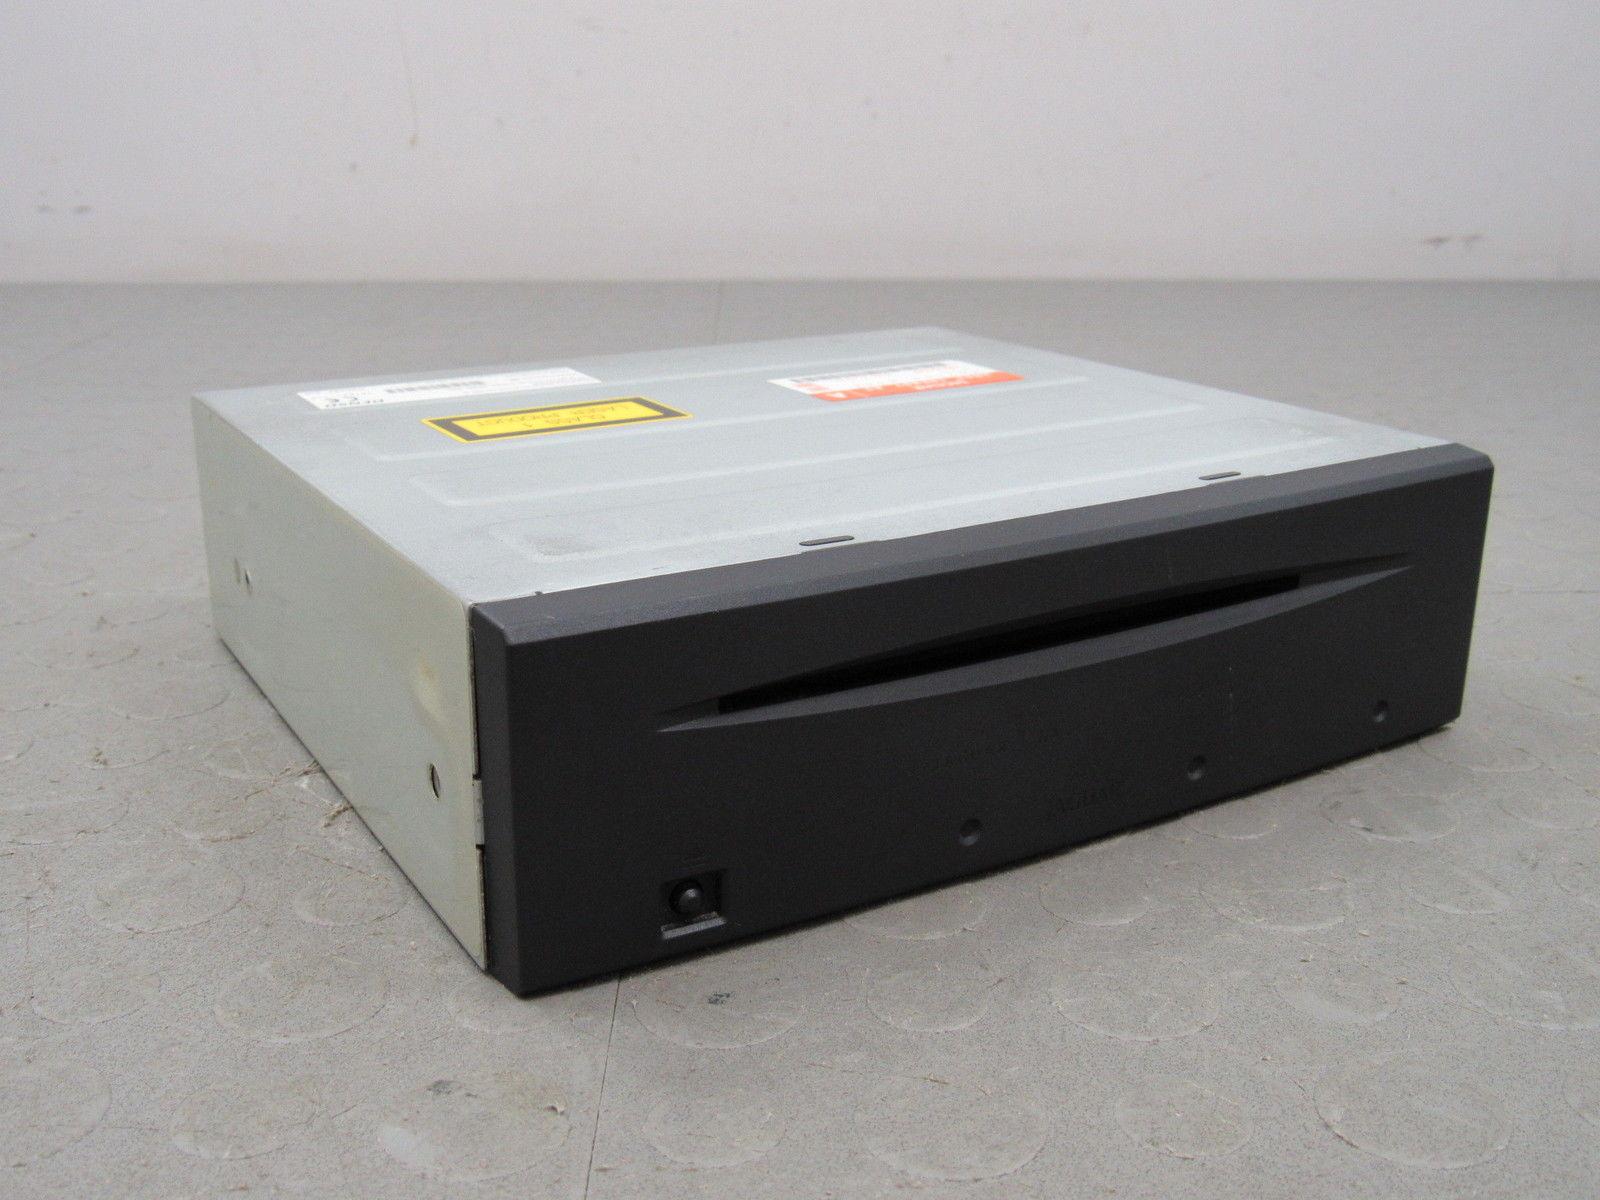 05-07 Jaguar XJ8 X Type Vanden Plas GPS DVD ROM Navigation Disc Drive  Player B